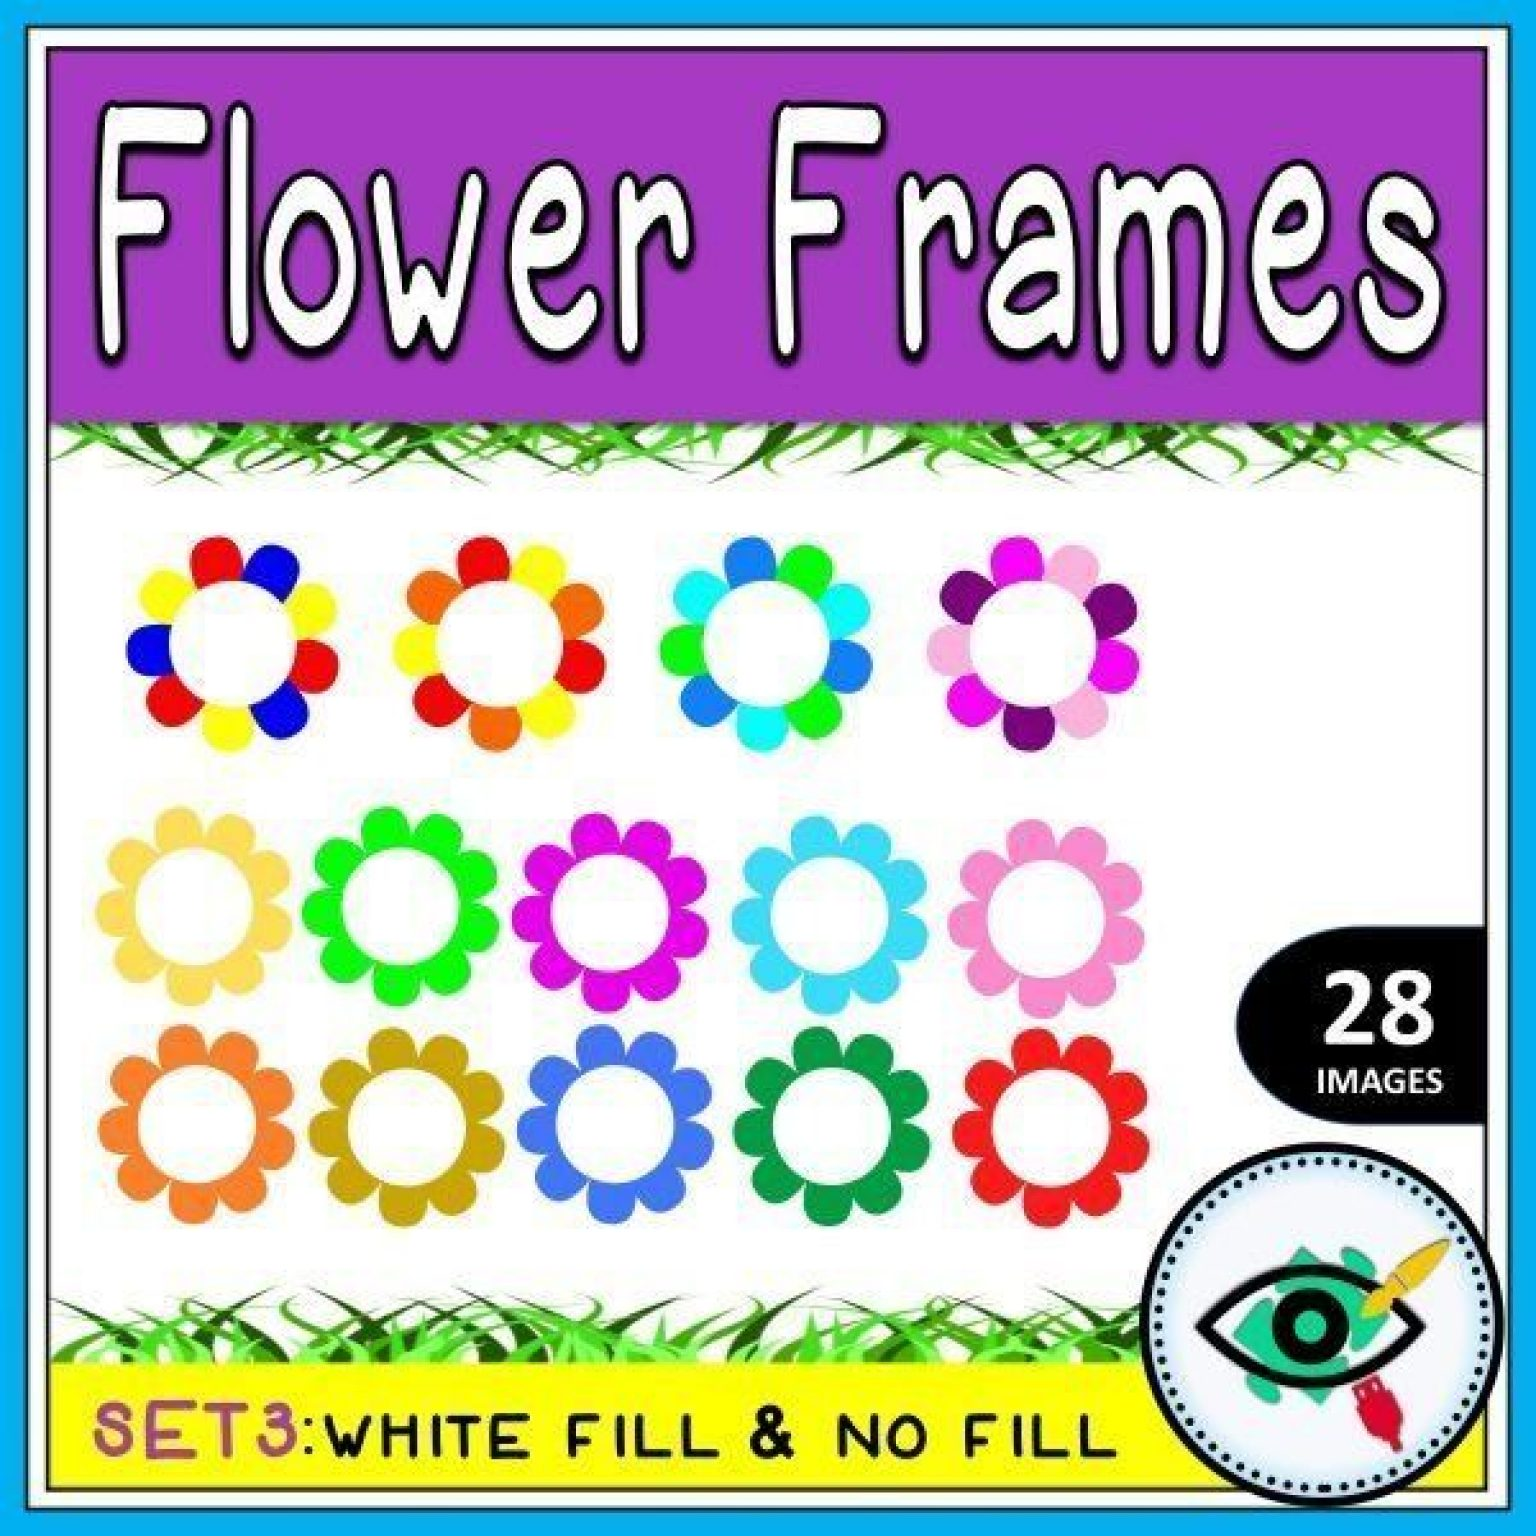 flower-frames-title-3